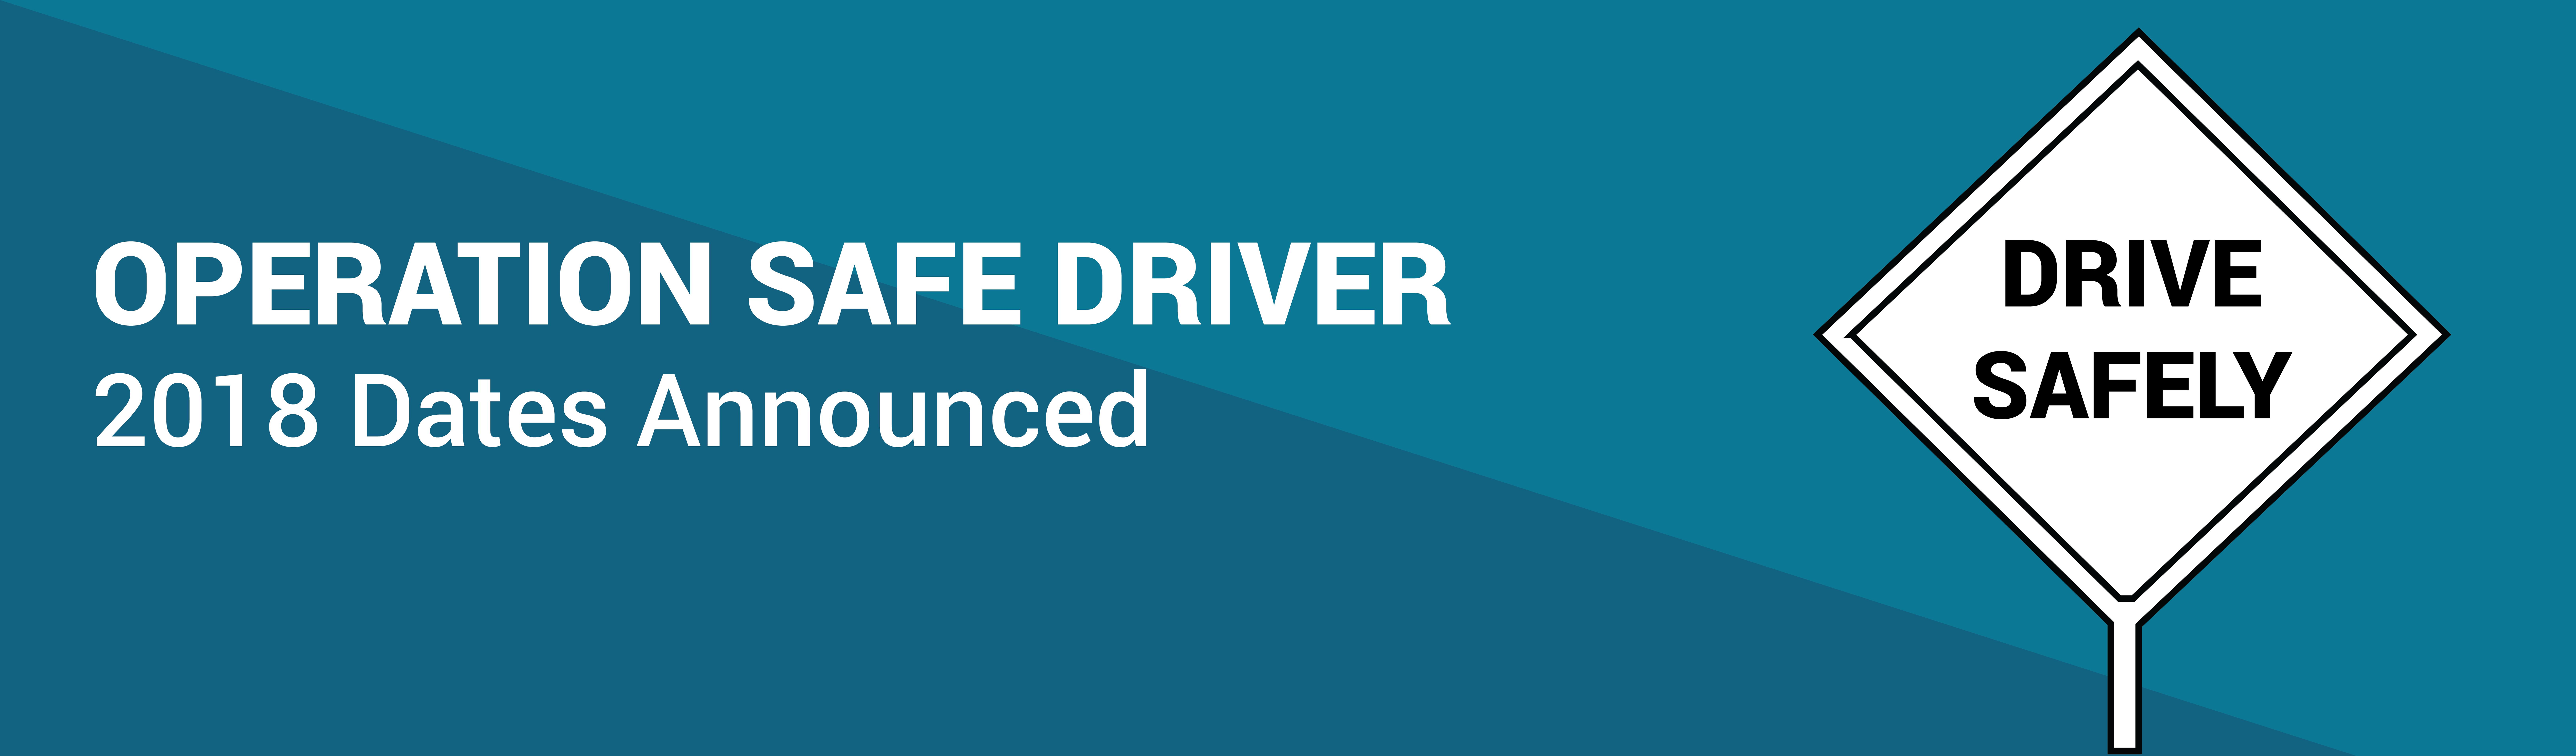 Operation Safe Driver 2018